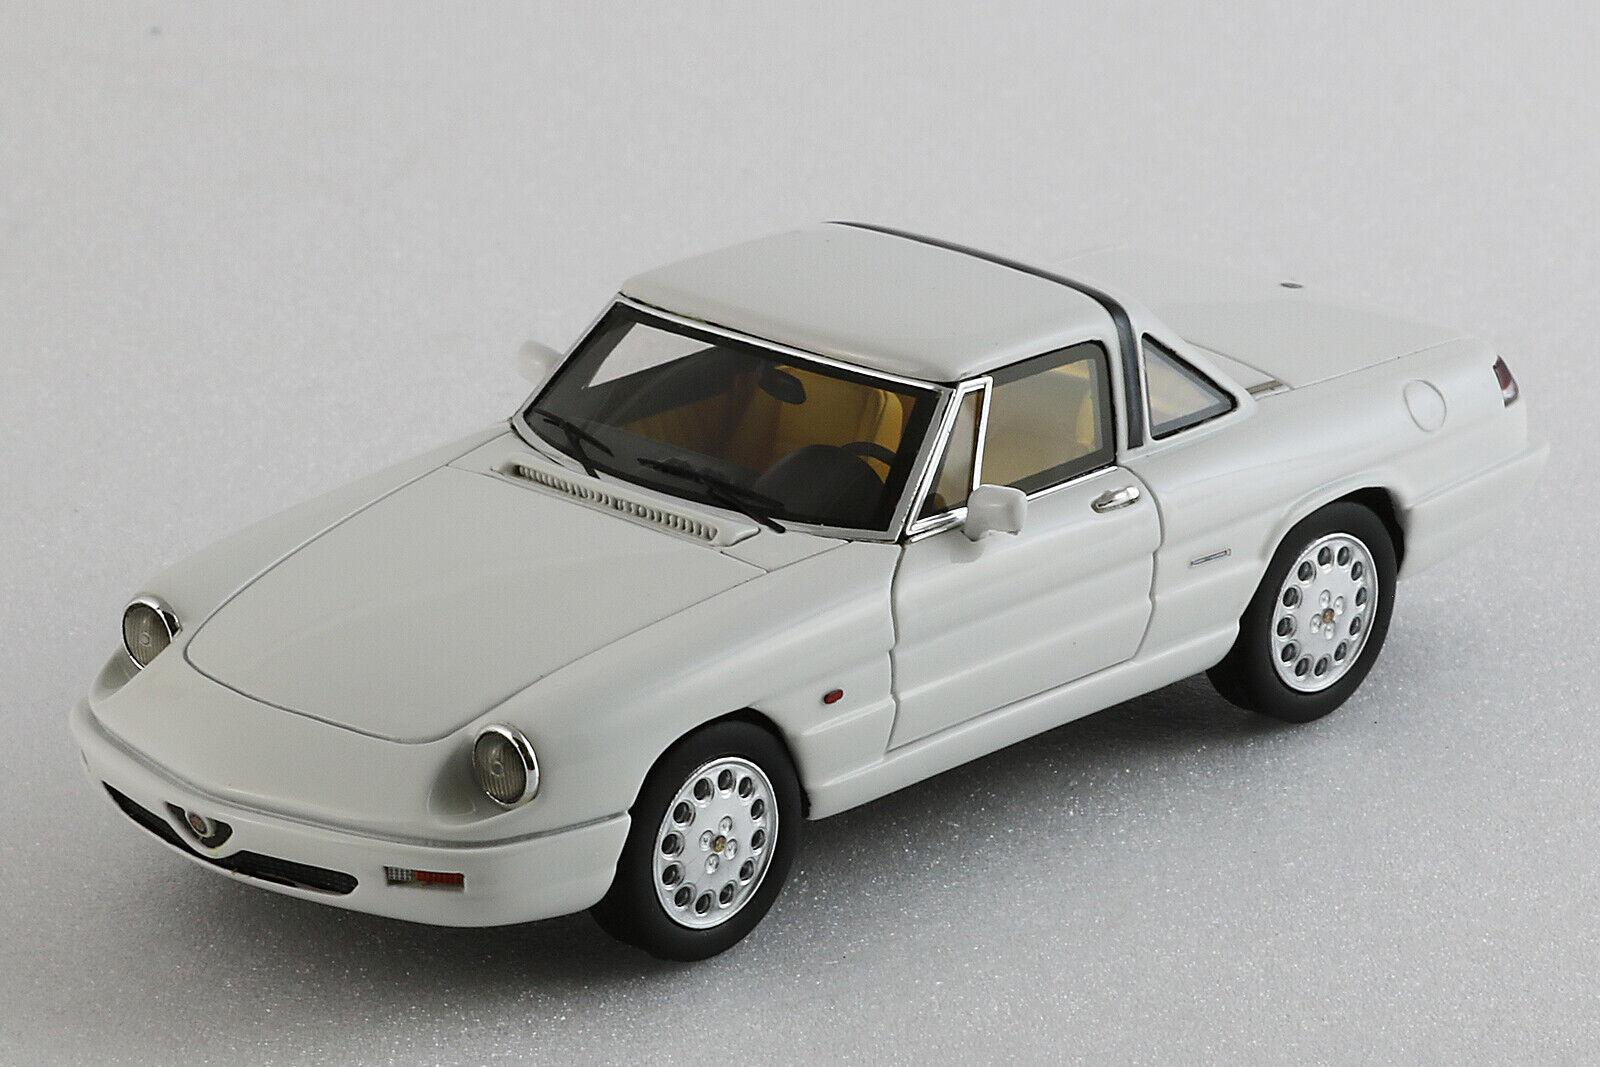 Alfa Romeo Spider 1990 4a serie Hardtop - 1 43ème - Blanc - Milena Rose